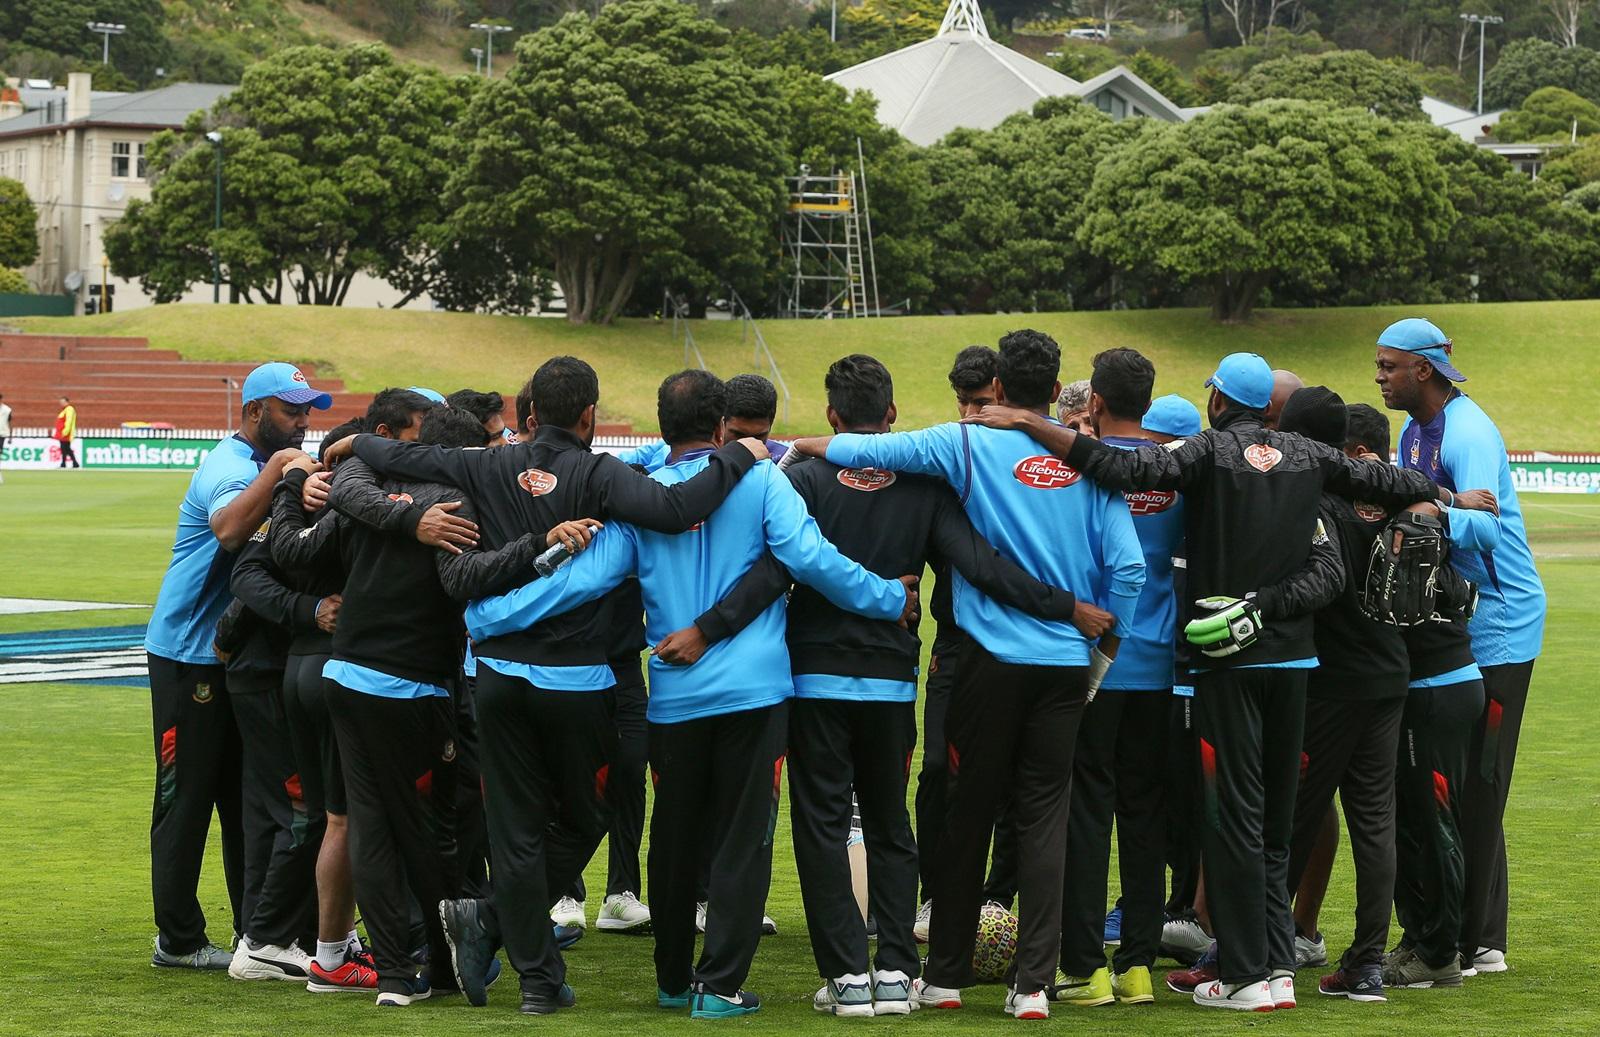 New Zealand cricket team mourns loss of 50 lives slain.